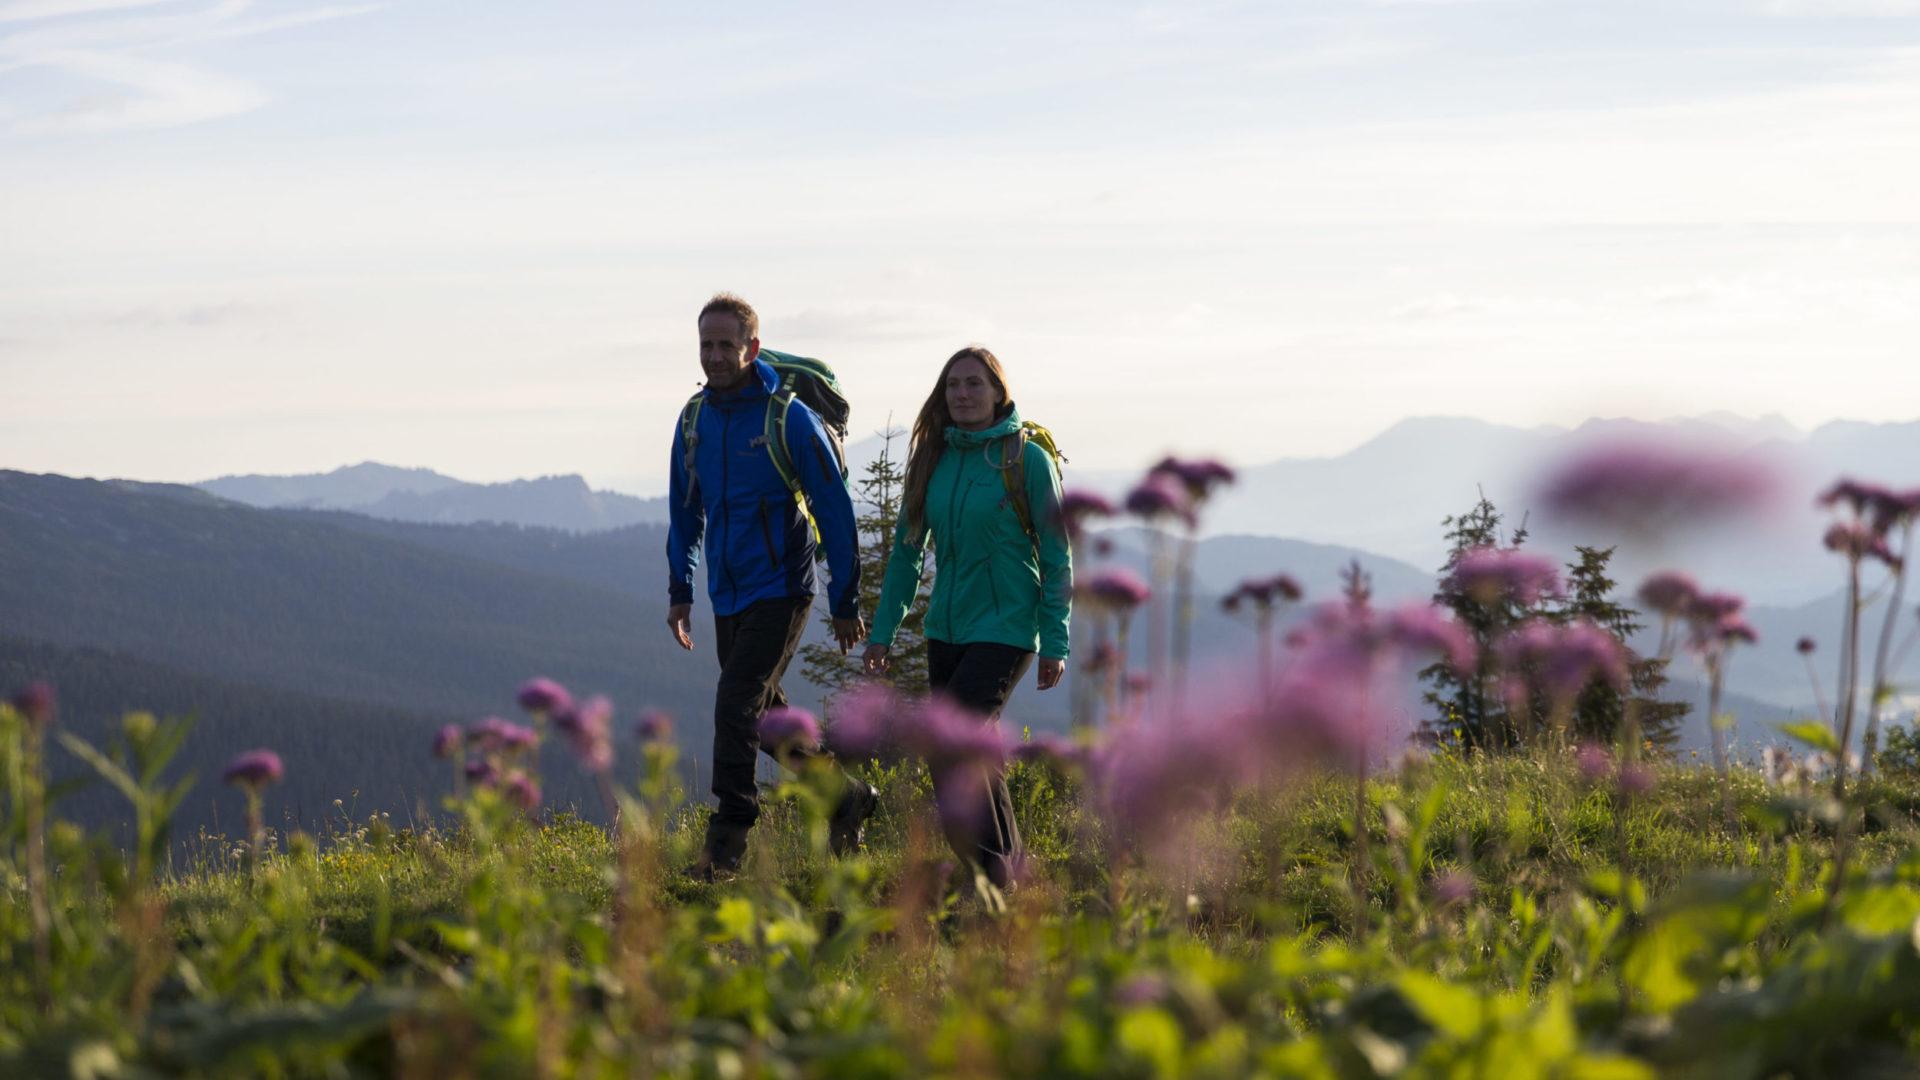 Sonnenaufgangswanderung aufs Walmendingerhorn im Kleinwalsertal © Oliver Farys / Kleinwalsertal Tourismus